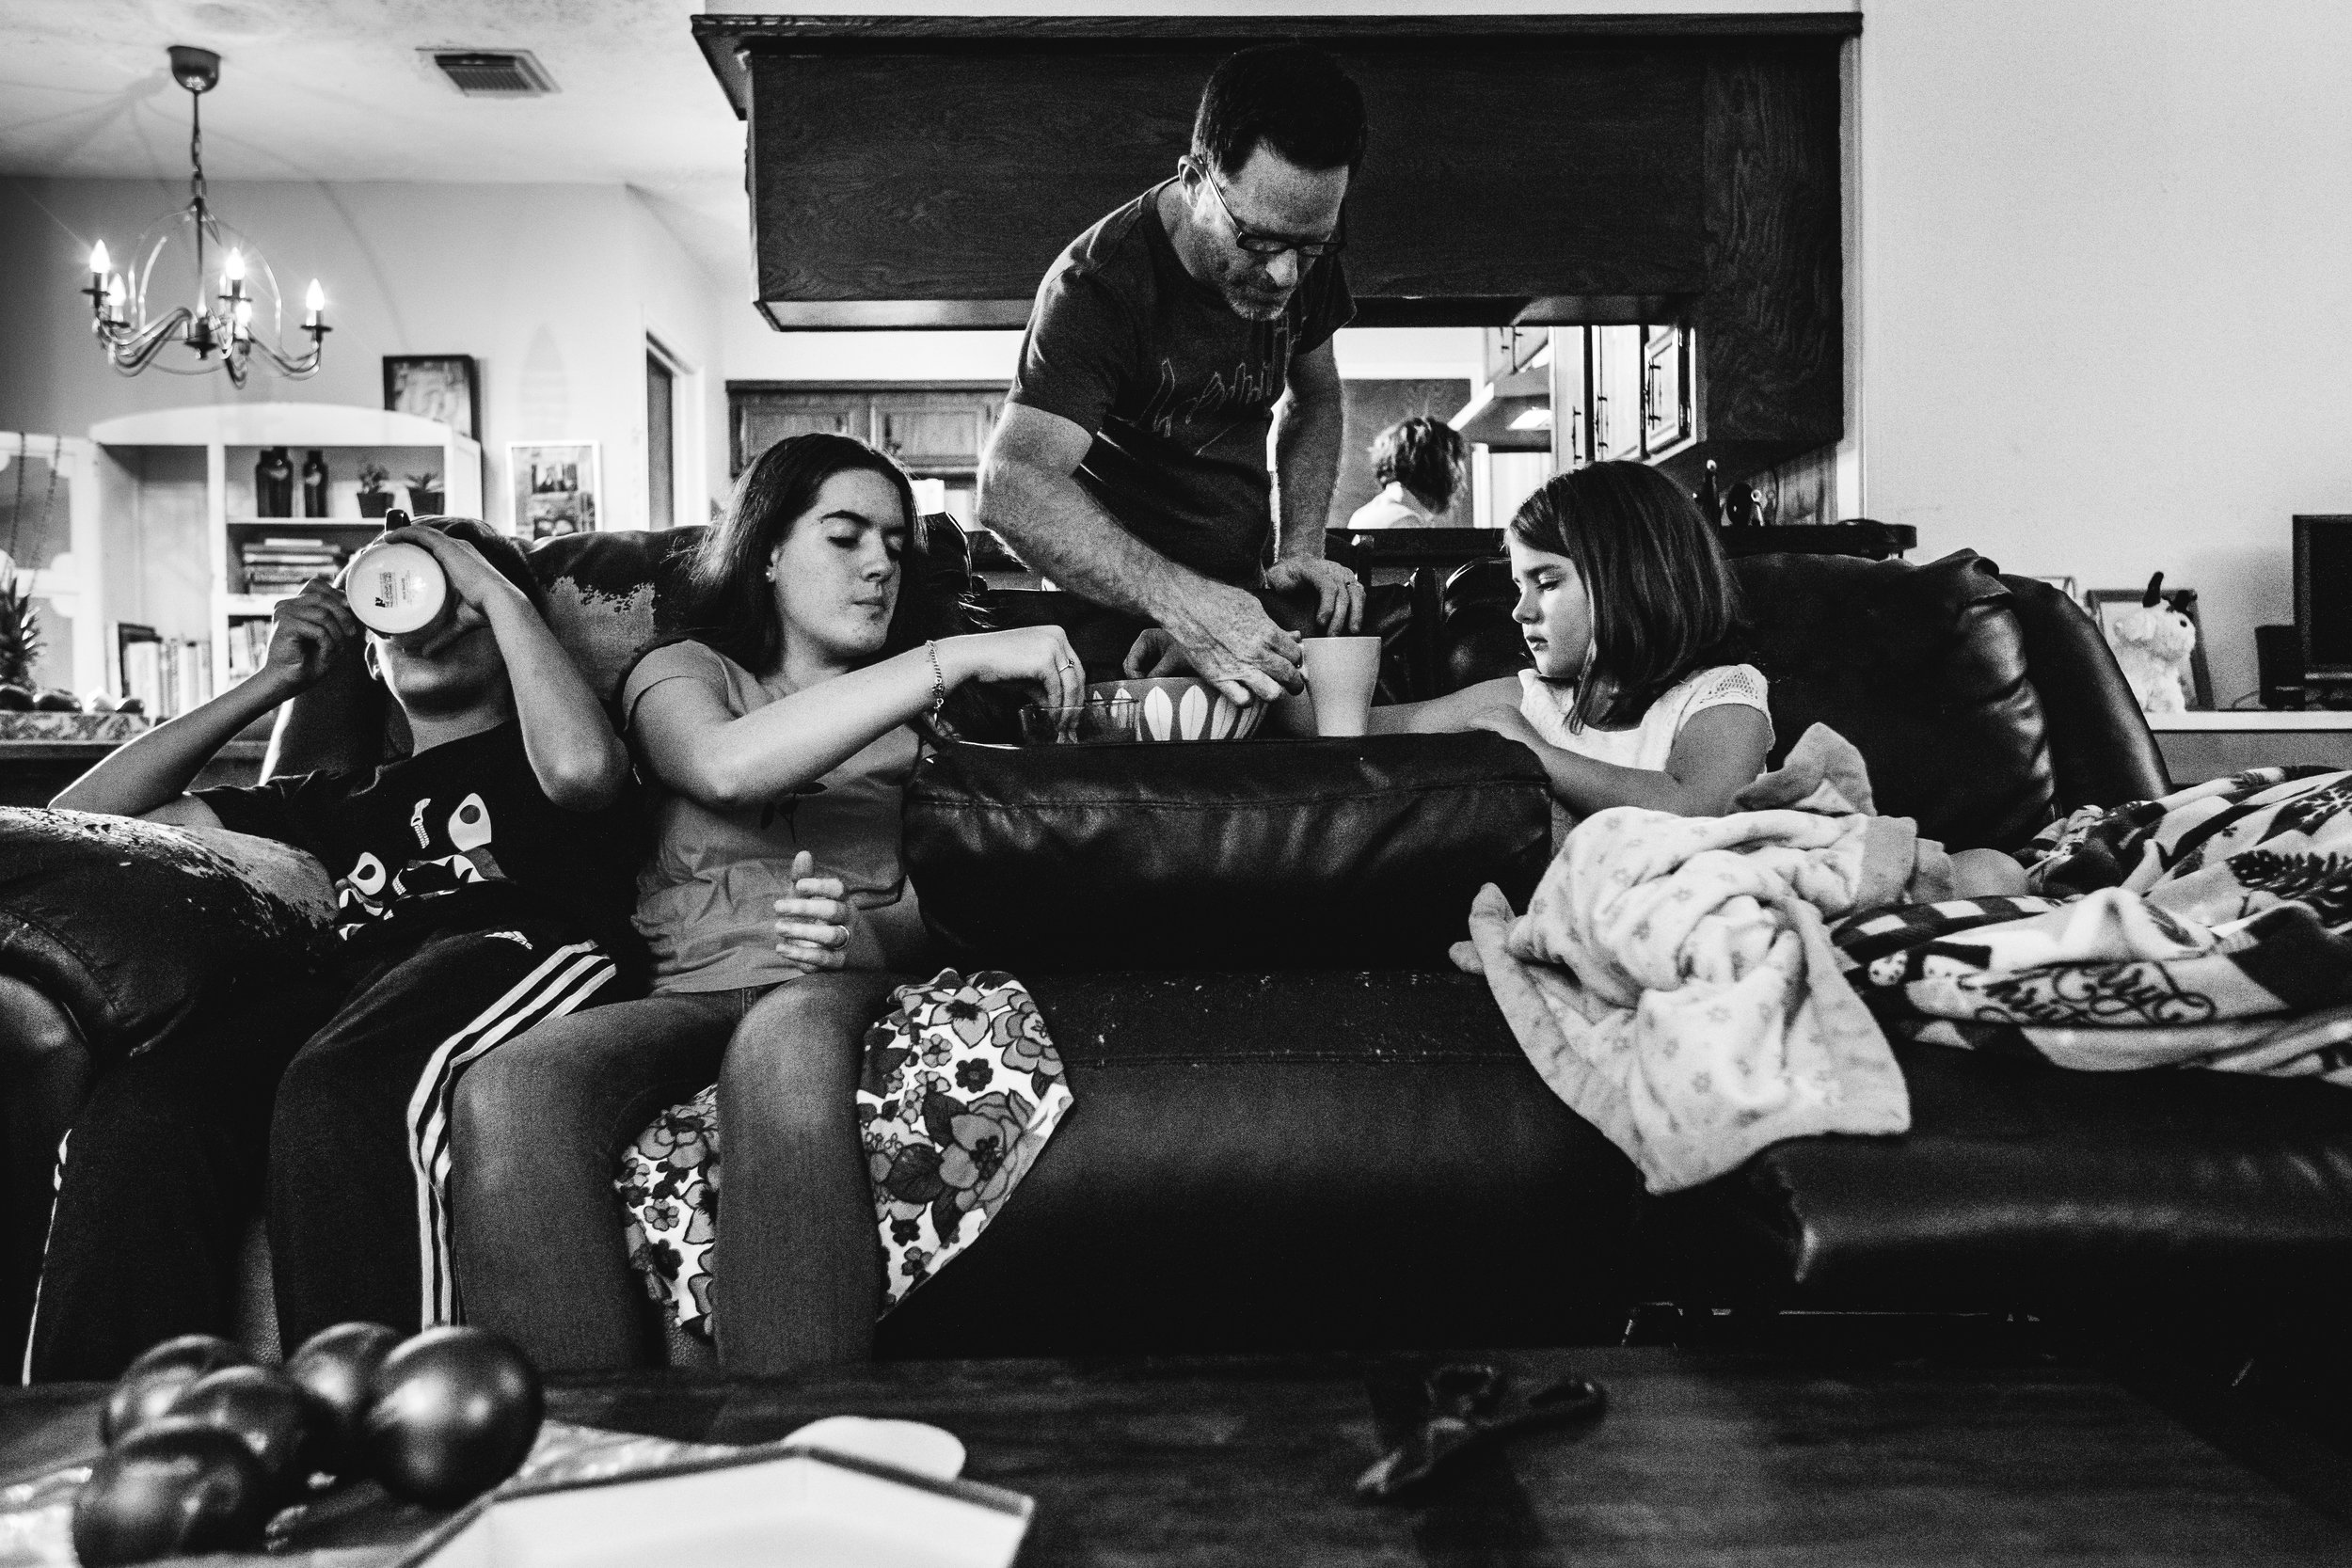 family-photographer-houston-miertschin-0038.jpg